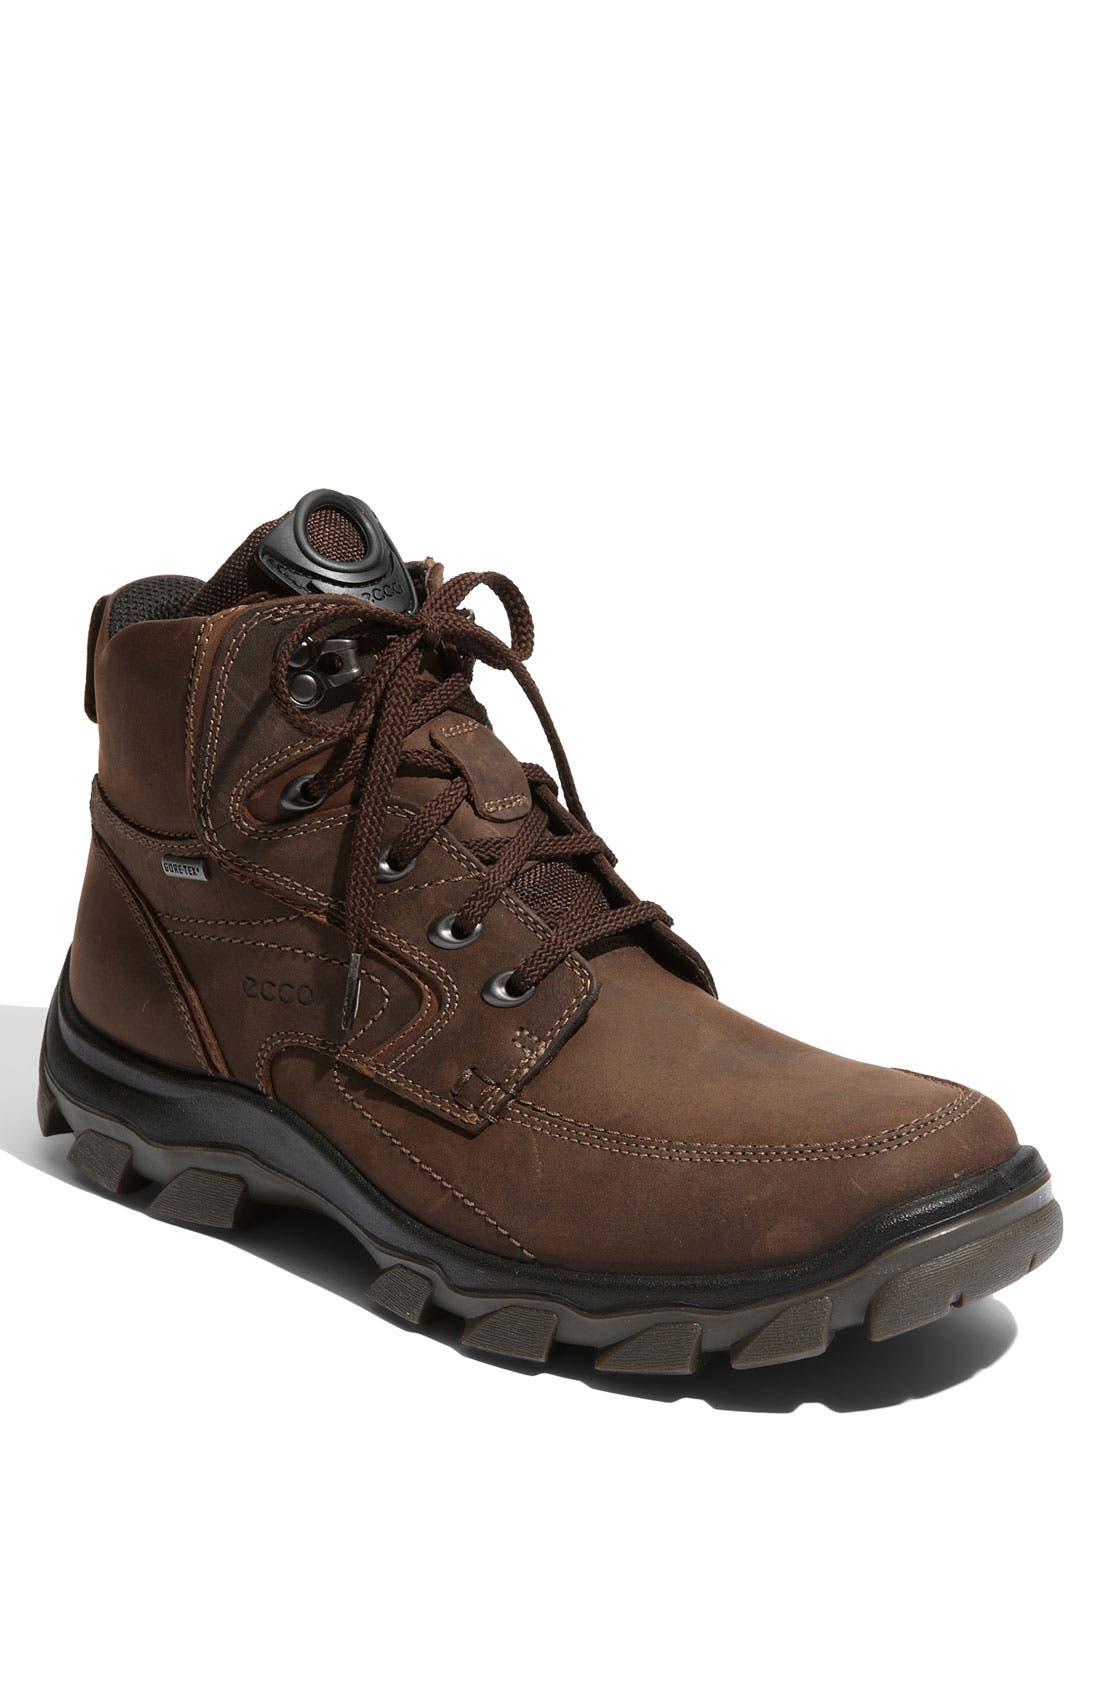 Alternate Image 1 Selected - ECCO 'Track 5' Waterproof Moc Toe Boot